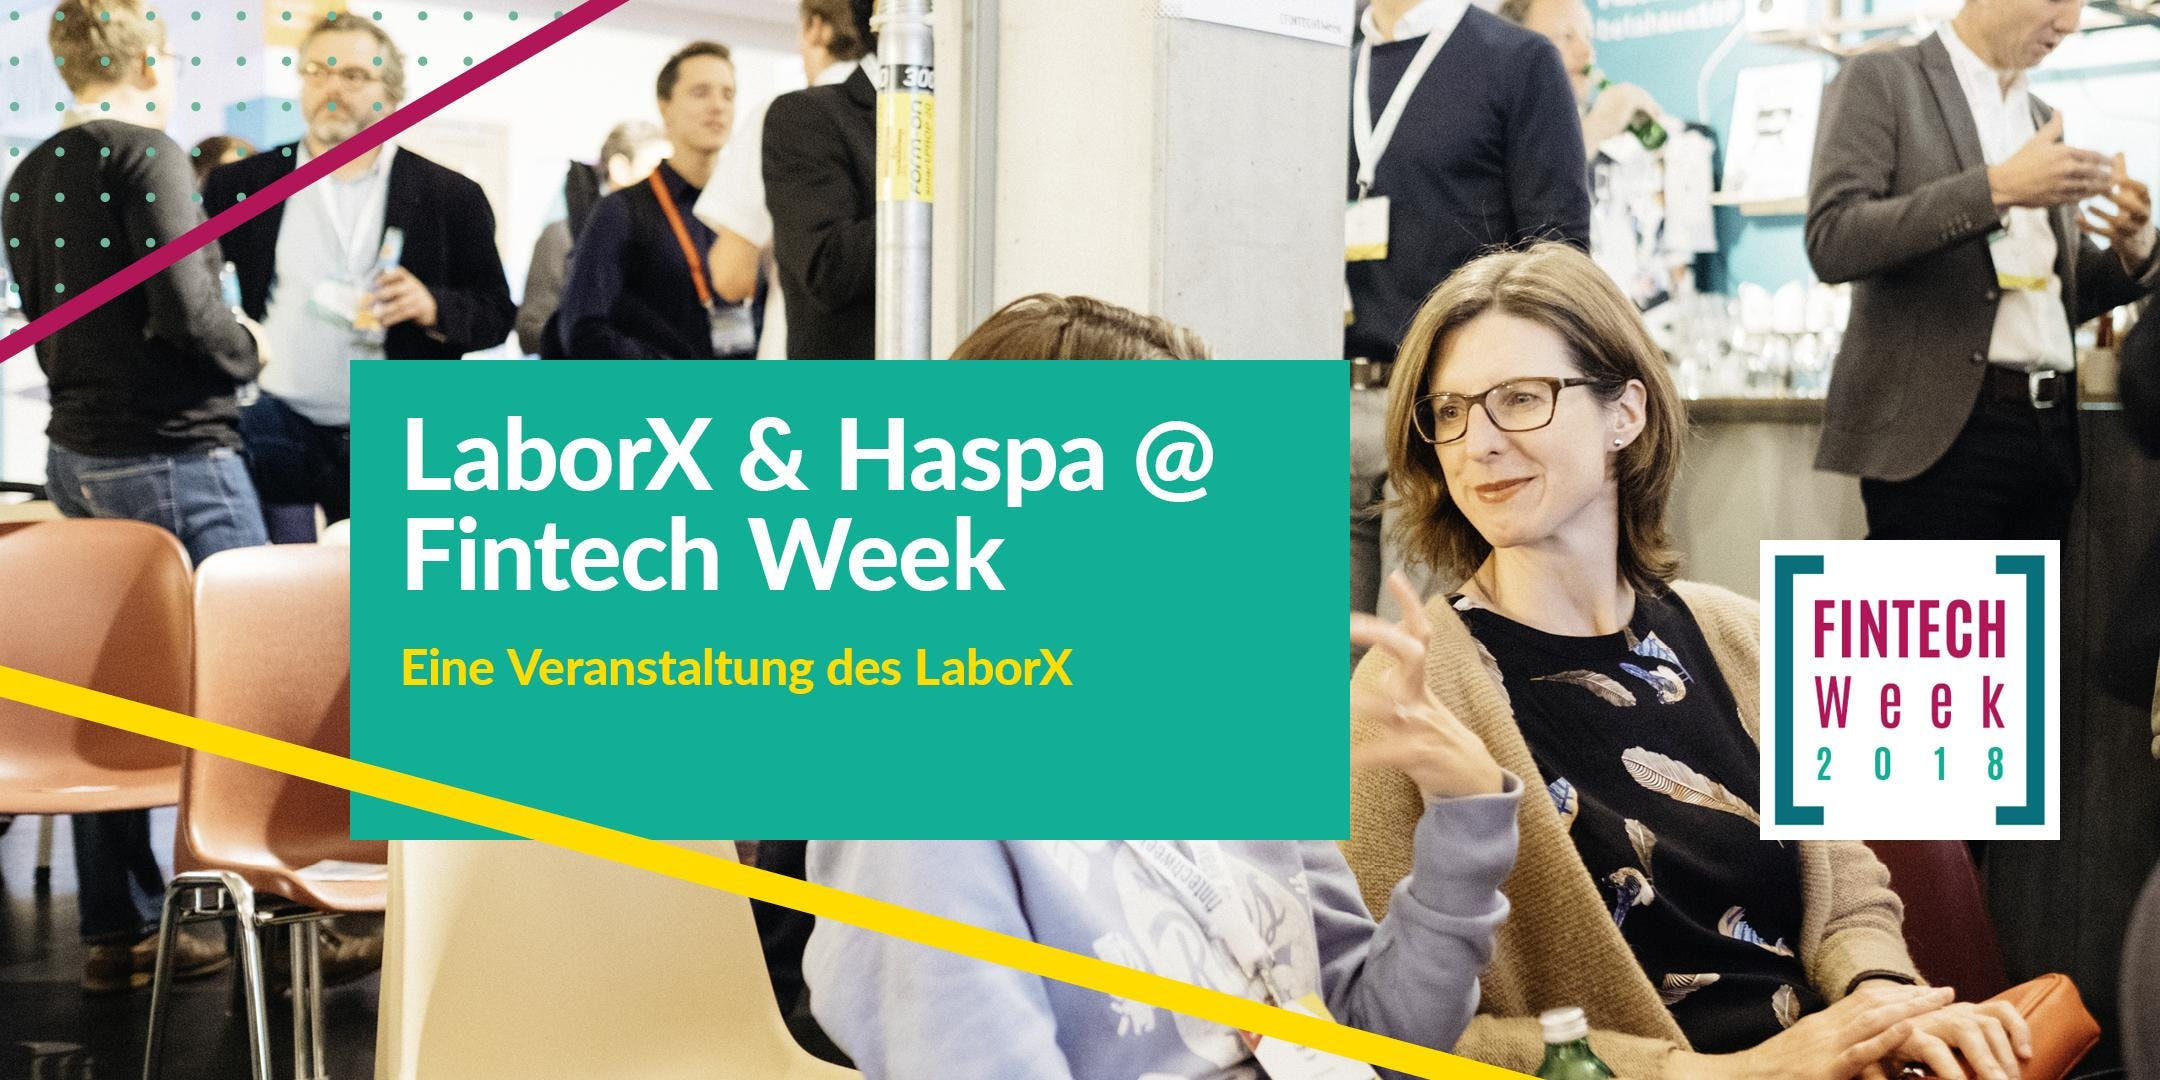 LaborX & Haspa @Fintech Week